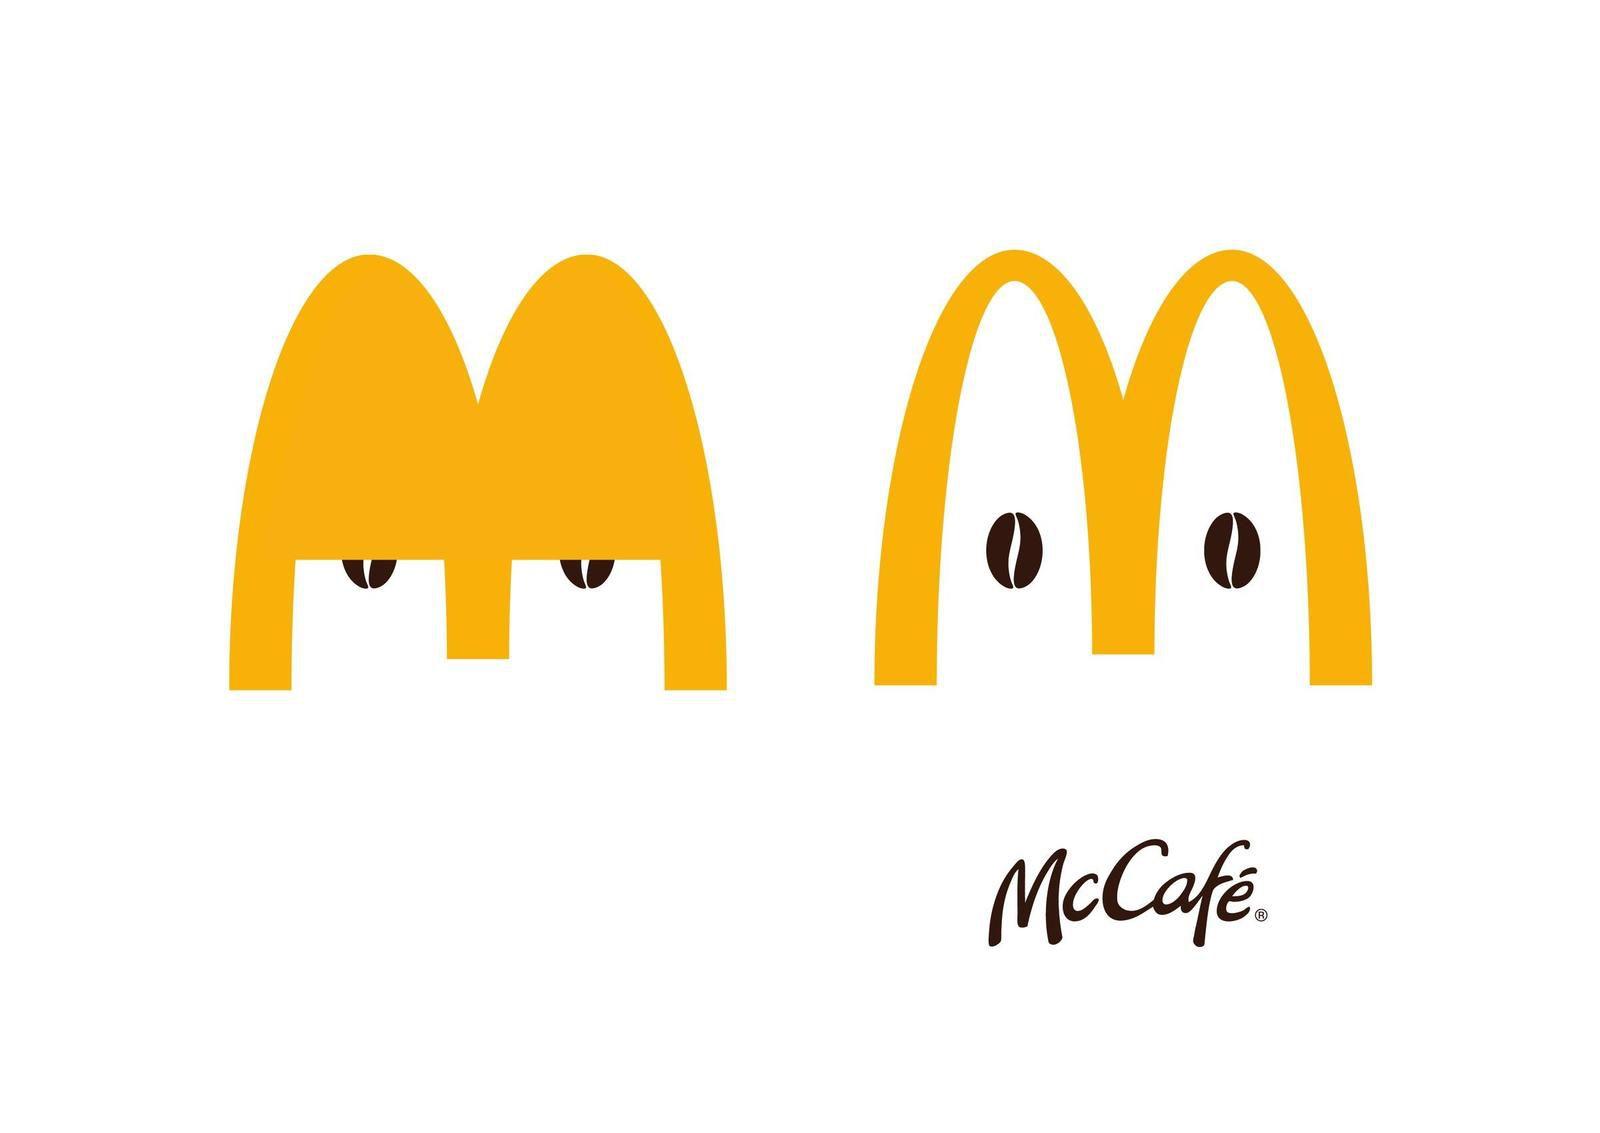 McCafé/McDonald's I Agence : Leo's Thjnk Tank, Munich, Allemagne (janvier 2020)